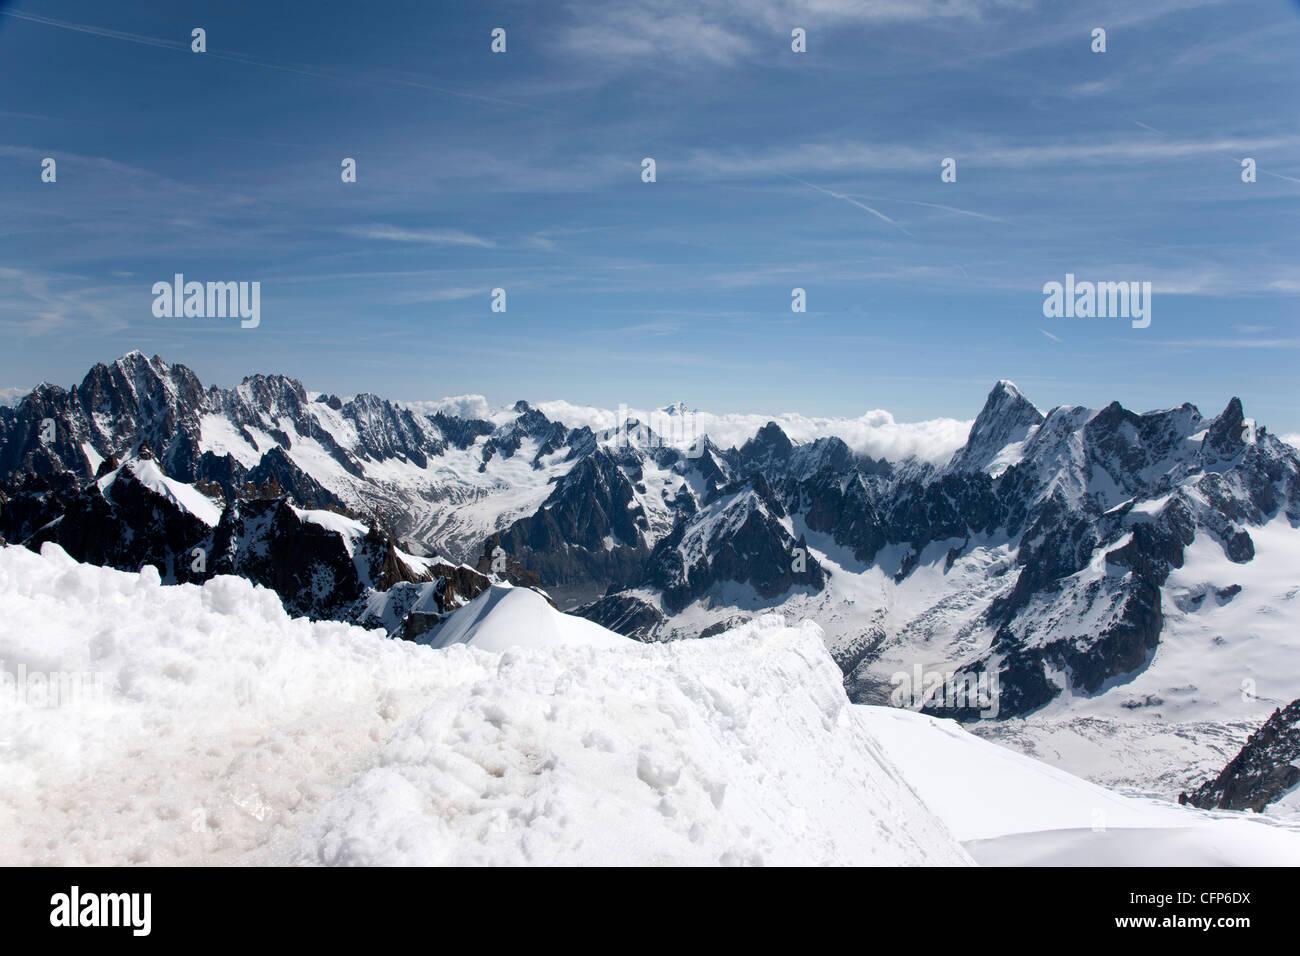 Aiguille du Midi, view of the Mont Blanc Massif, Chamonix, Haute Savoie, French Alps, France, Europe - Stock Image